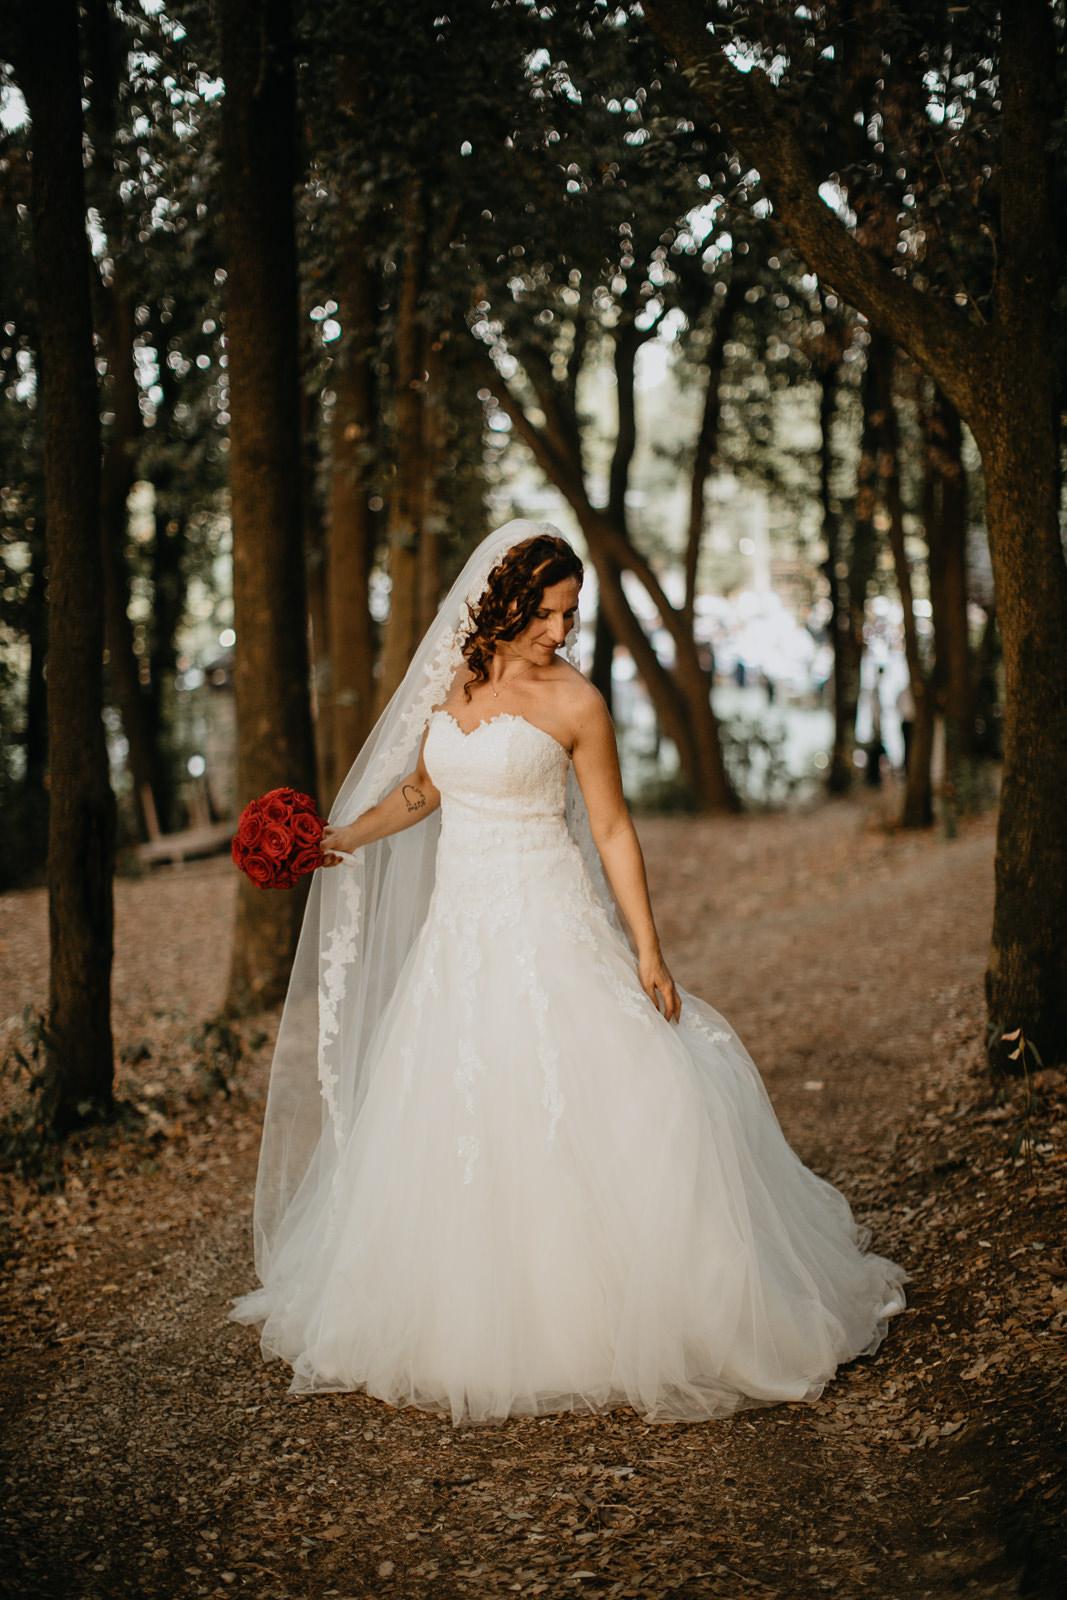 Best Wedding Photographers - Destination weddings -  Pat Cori Photography-28.jpg